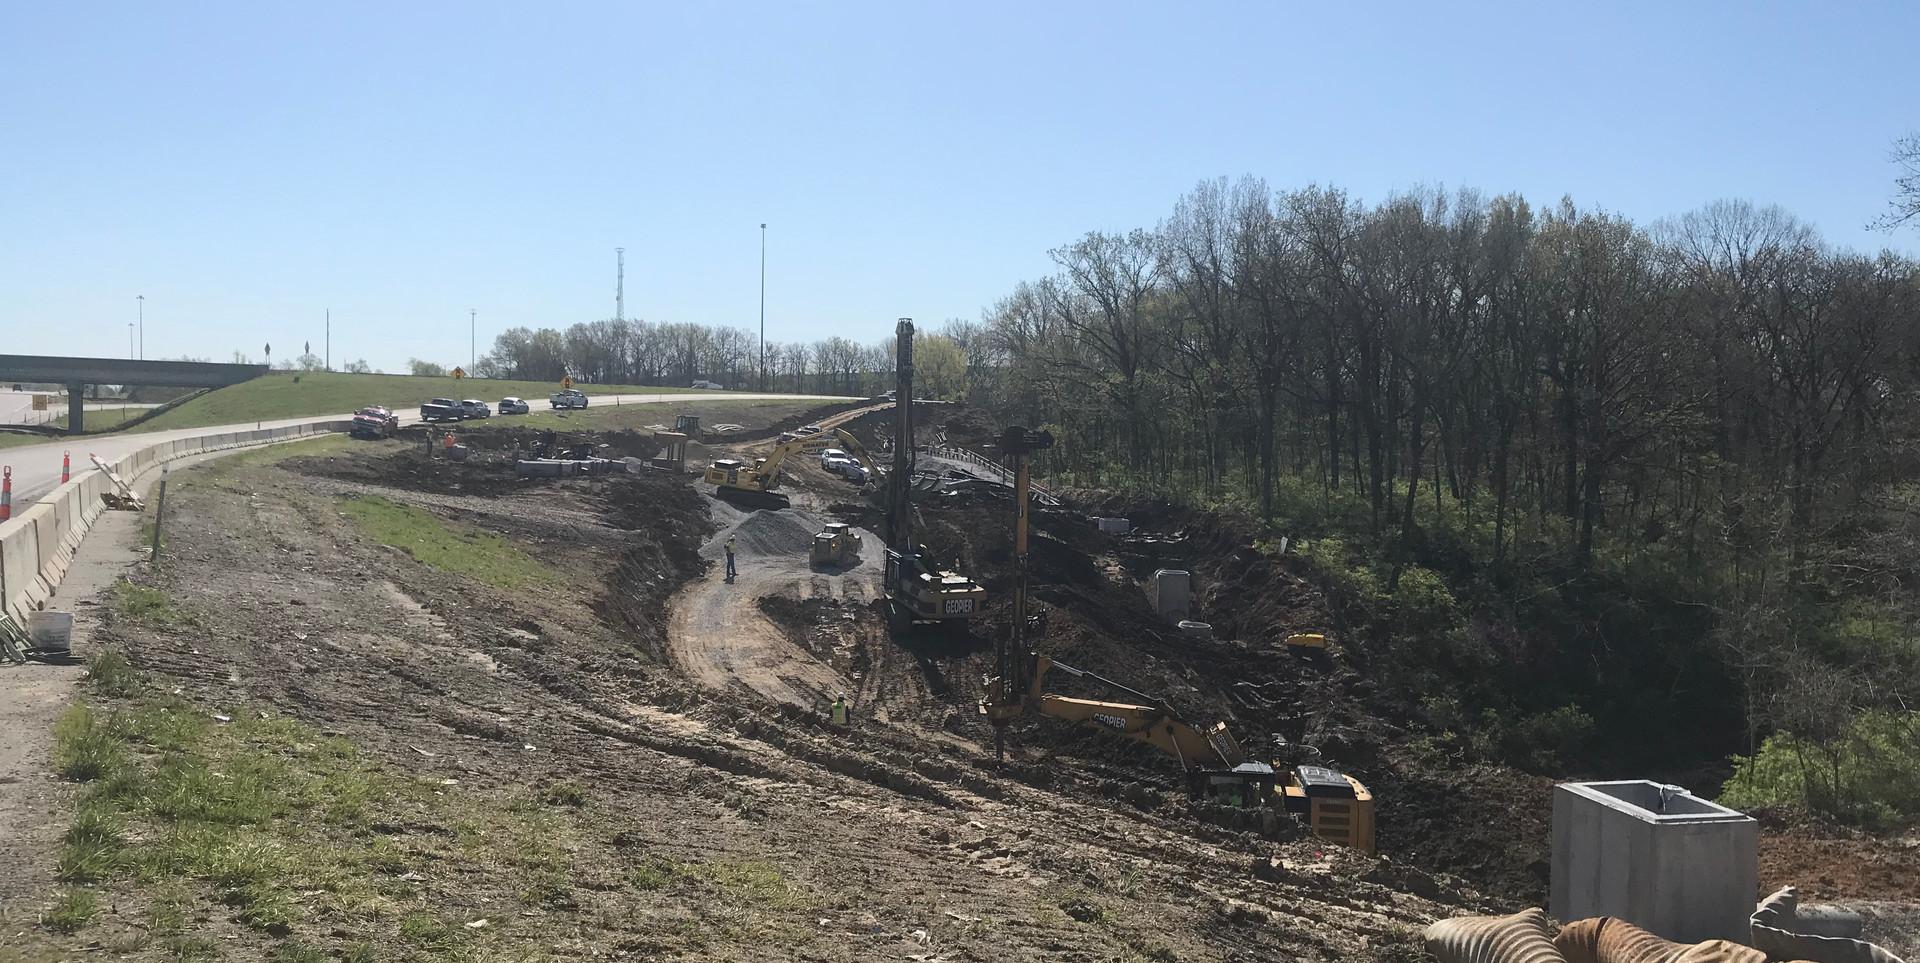 2020-04-21_WB I-70 to SB Turner Ramp grading.JPG